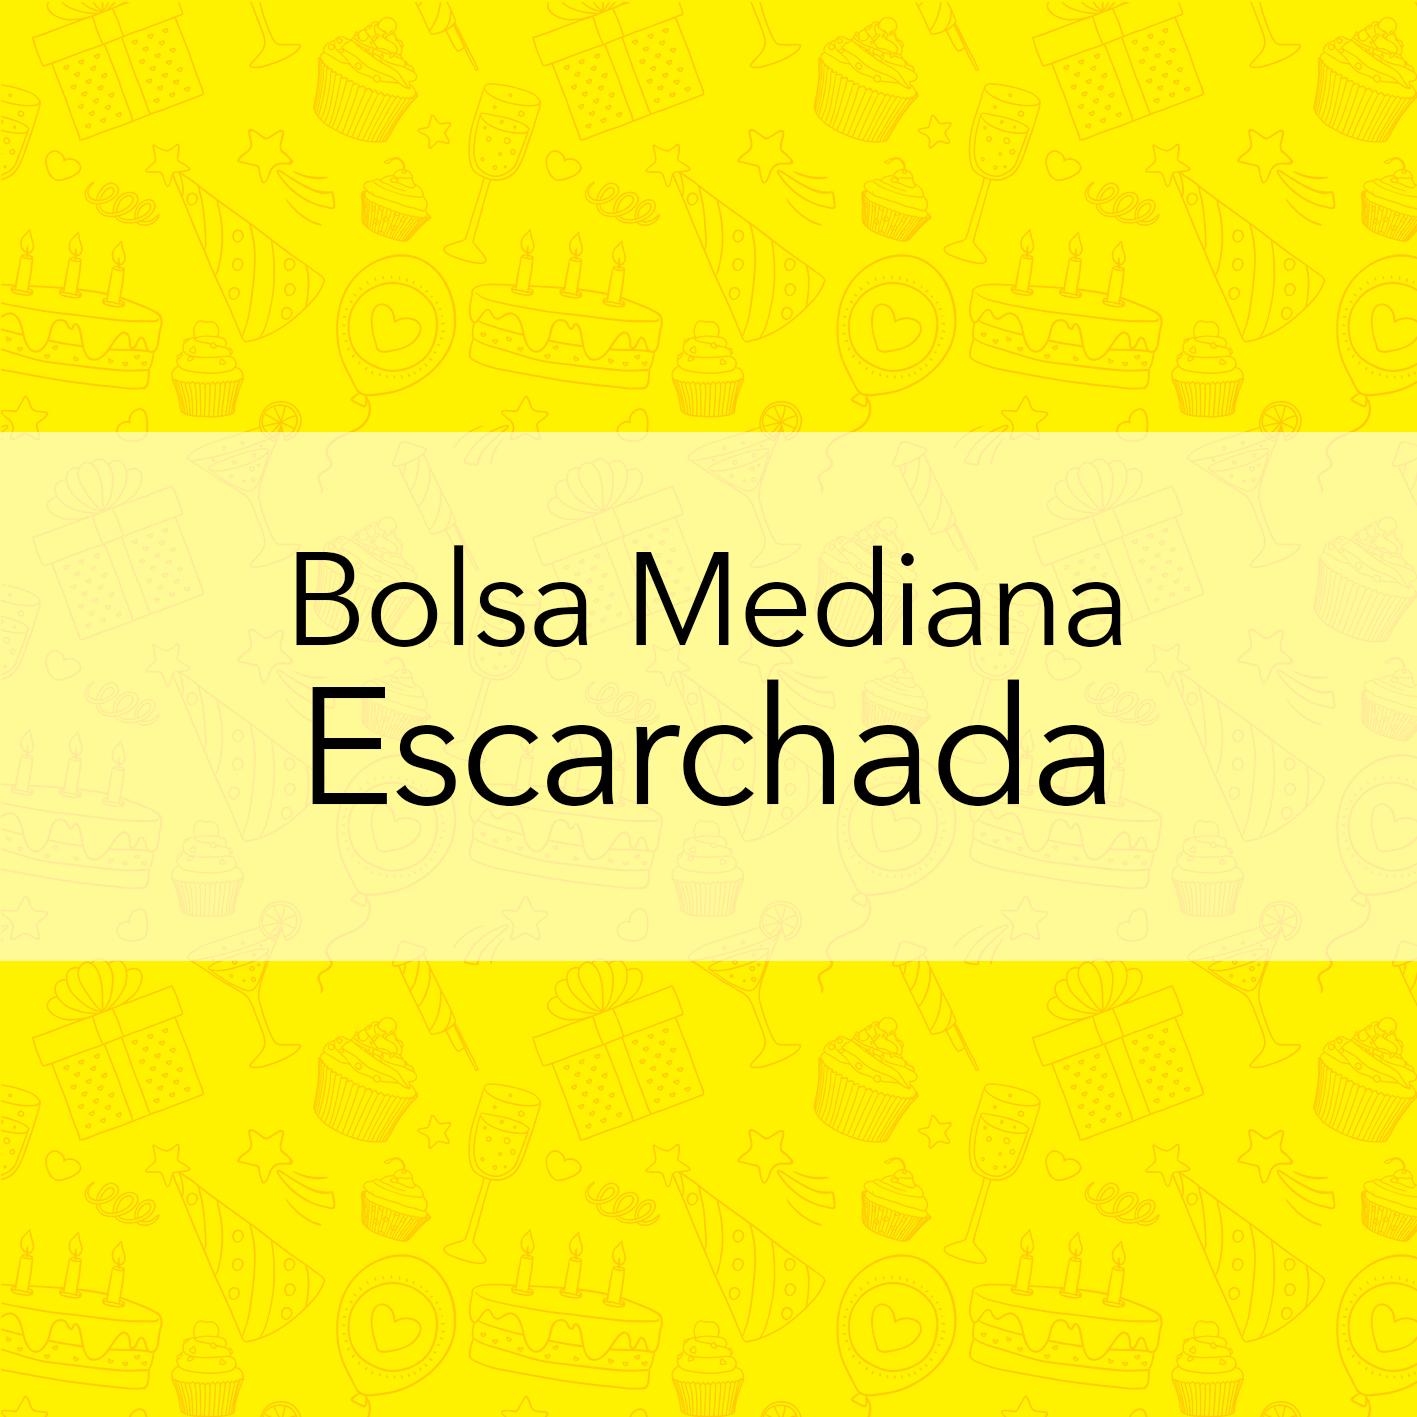 BOLSA MEDIANA ESCARCHADA